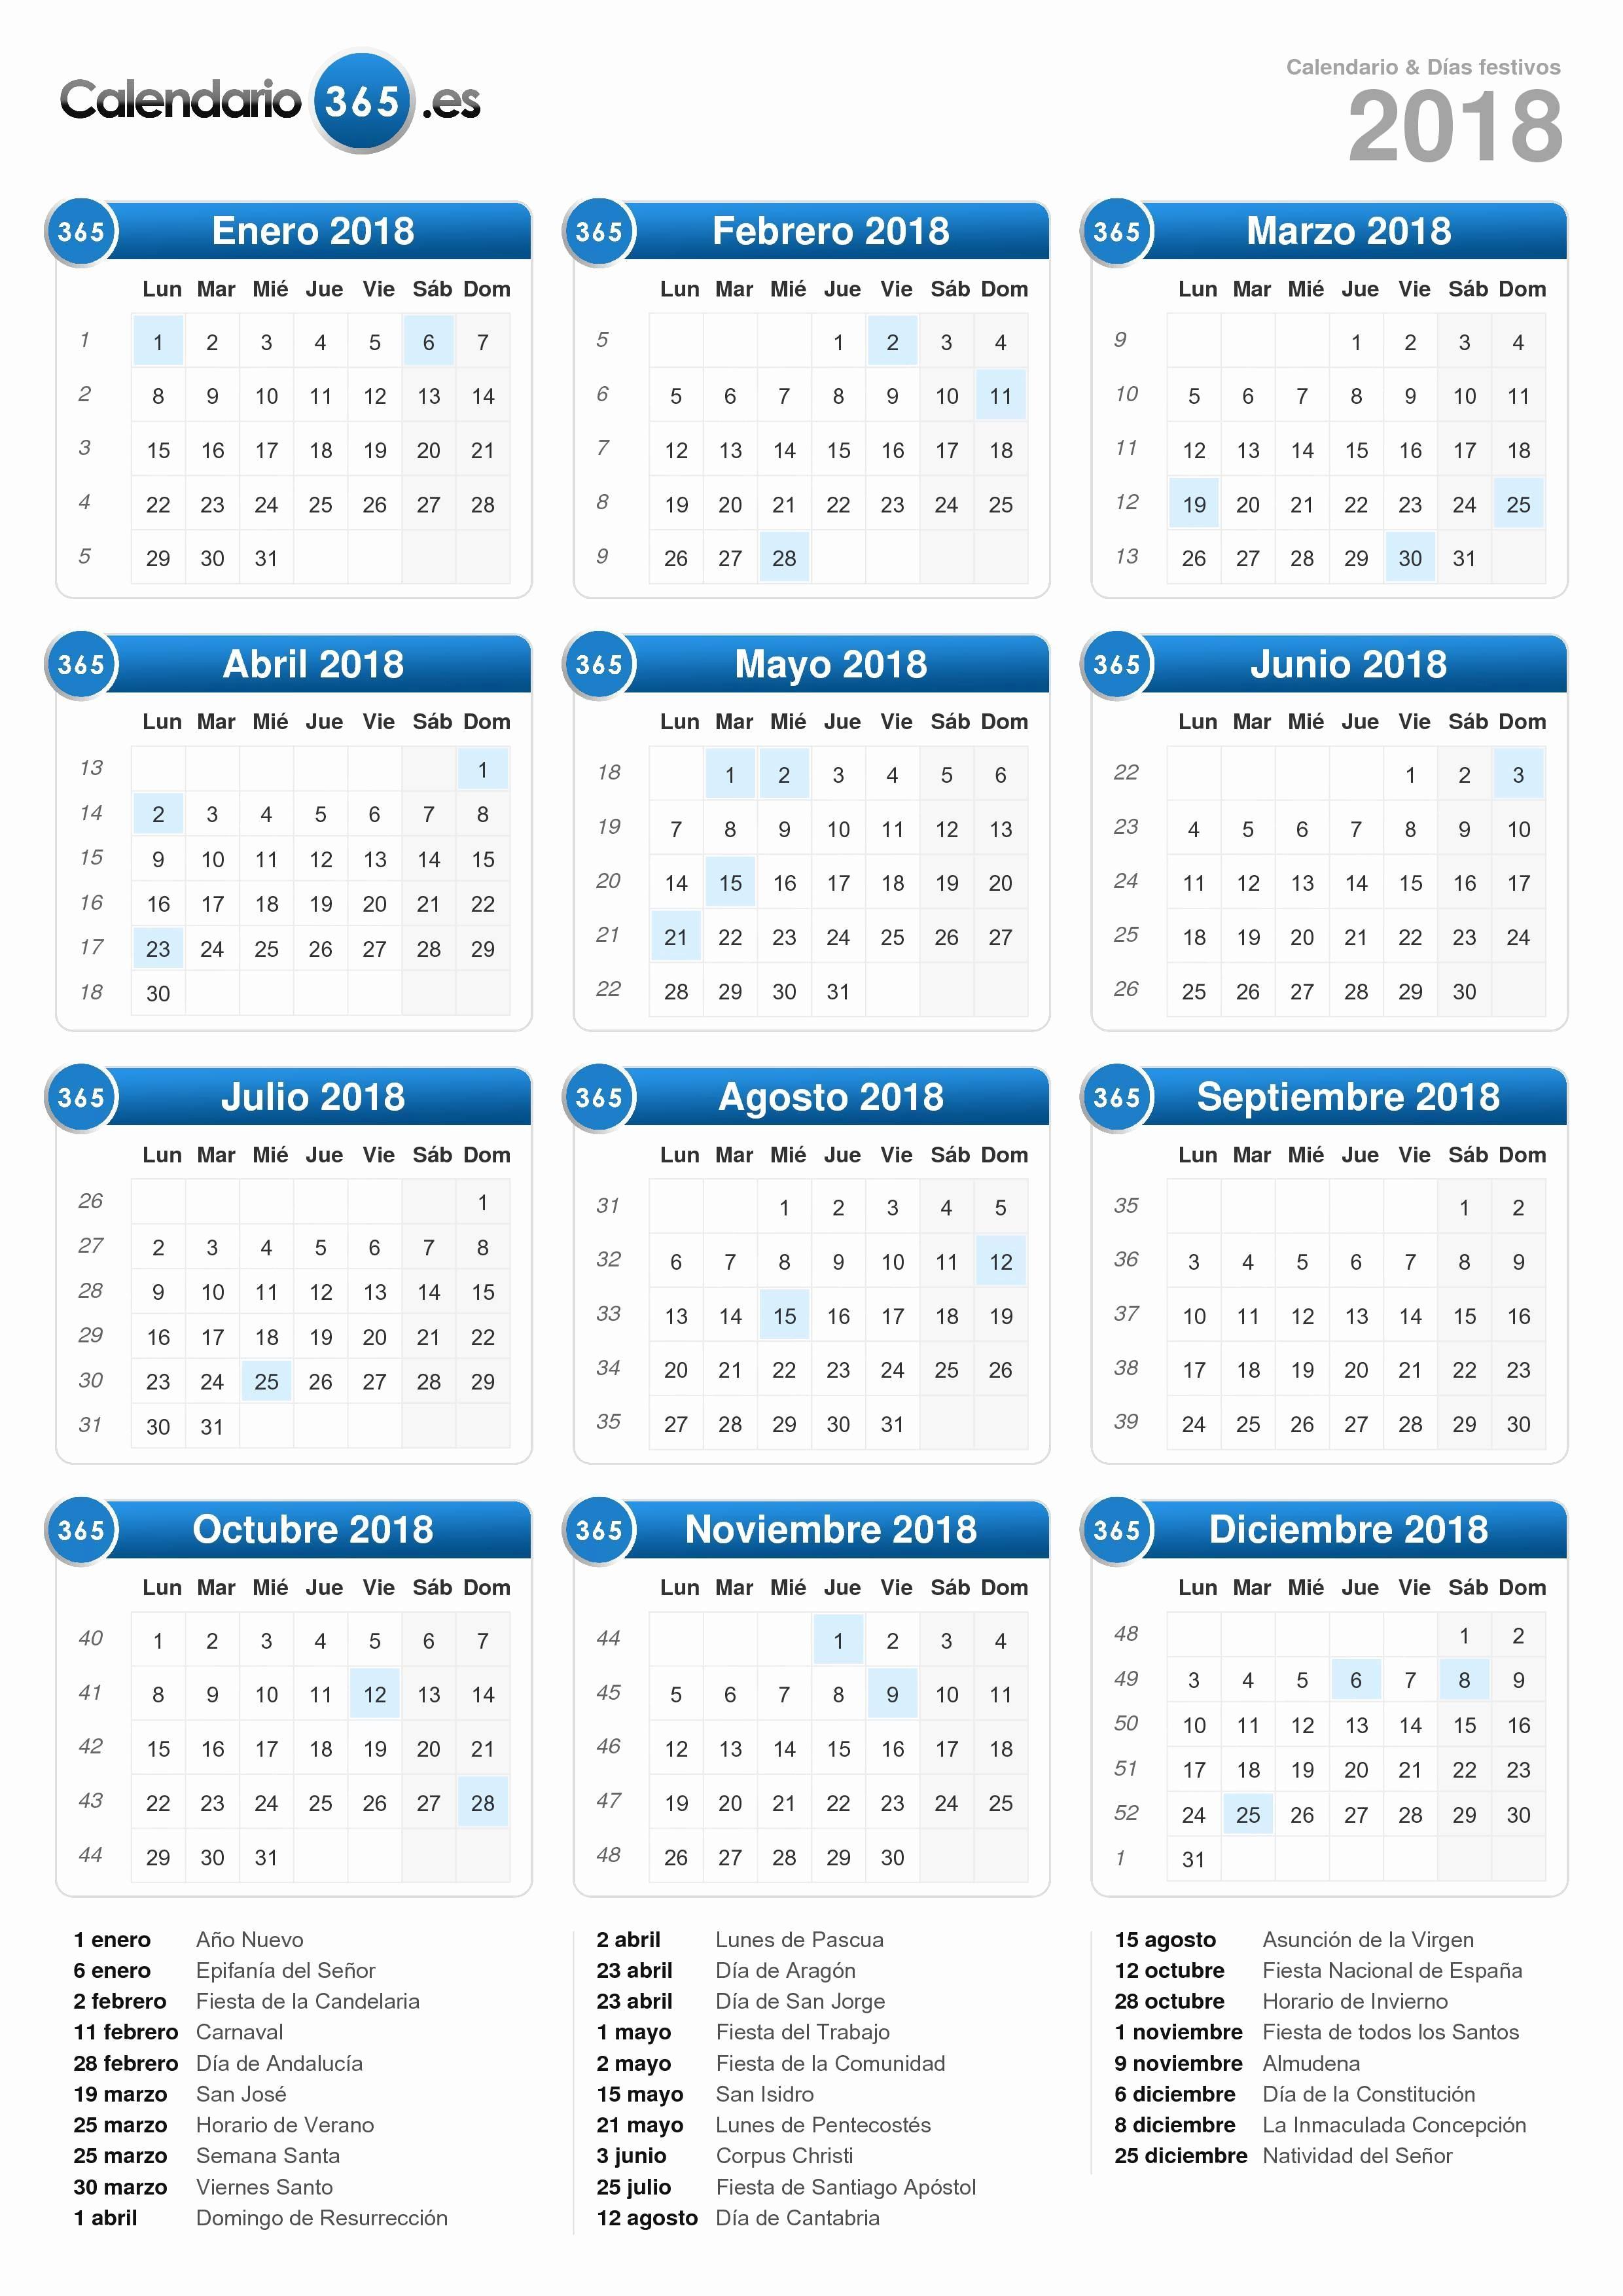 Calendario De Febrero 2018 Con Festivos Colombia Más Reciente Yllana Calendario 2019 2018 12 Of Calendario De Febrero 2018 Con Festivos Colombia Recientes Best Calendario Octubre 2017 Con Festivos Para Imprimir Image Collection